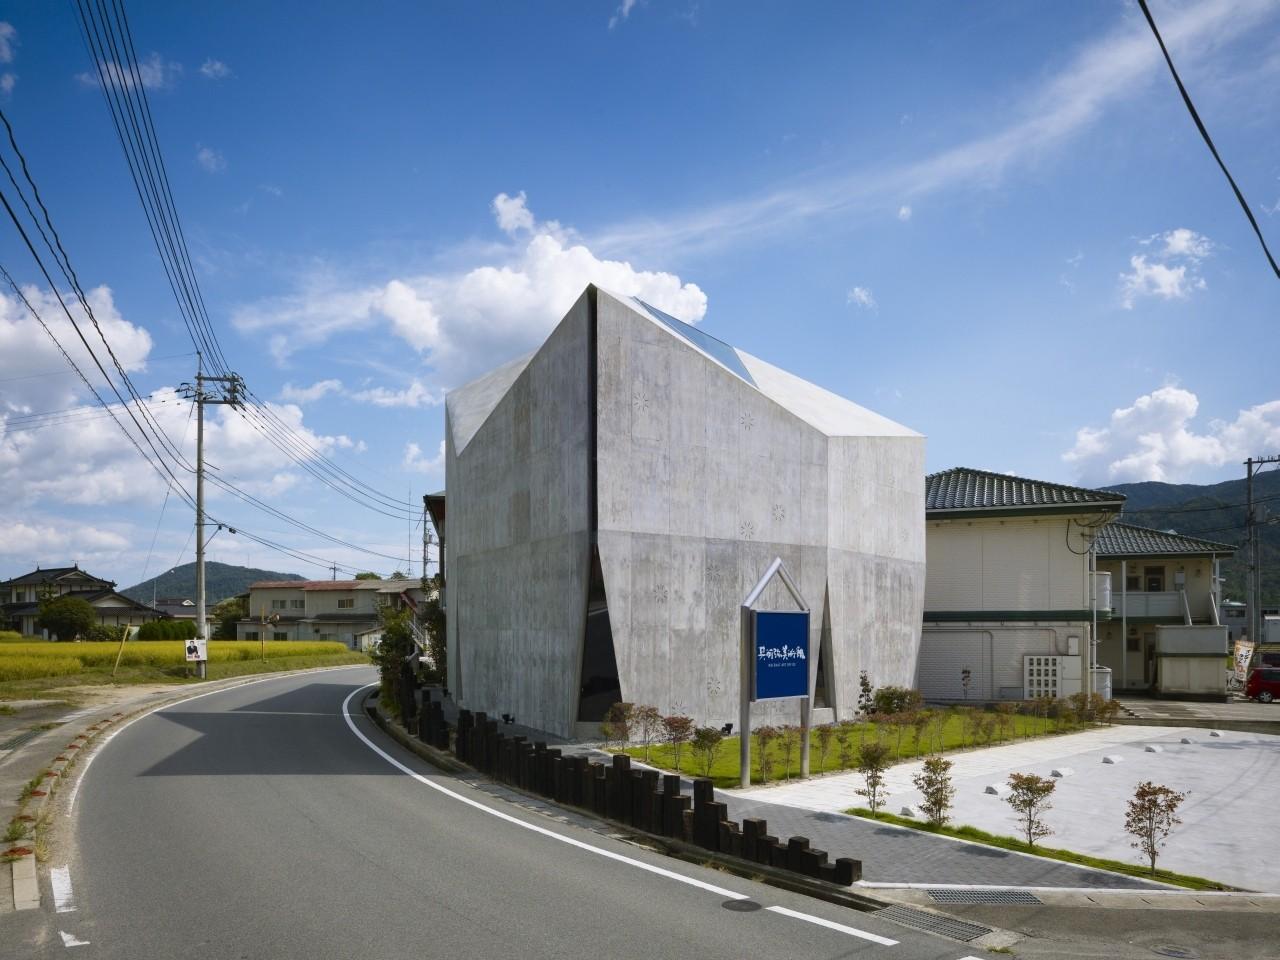 Mecenat Art Museum Naf Architect & Design - 16